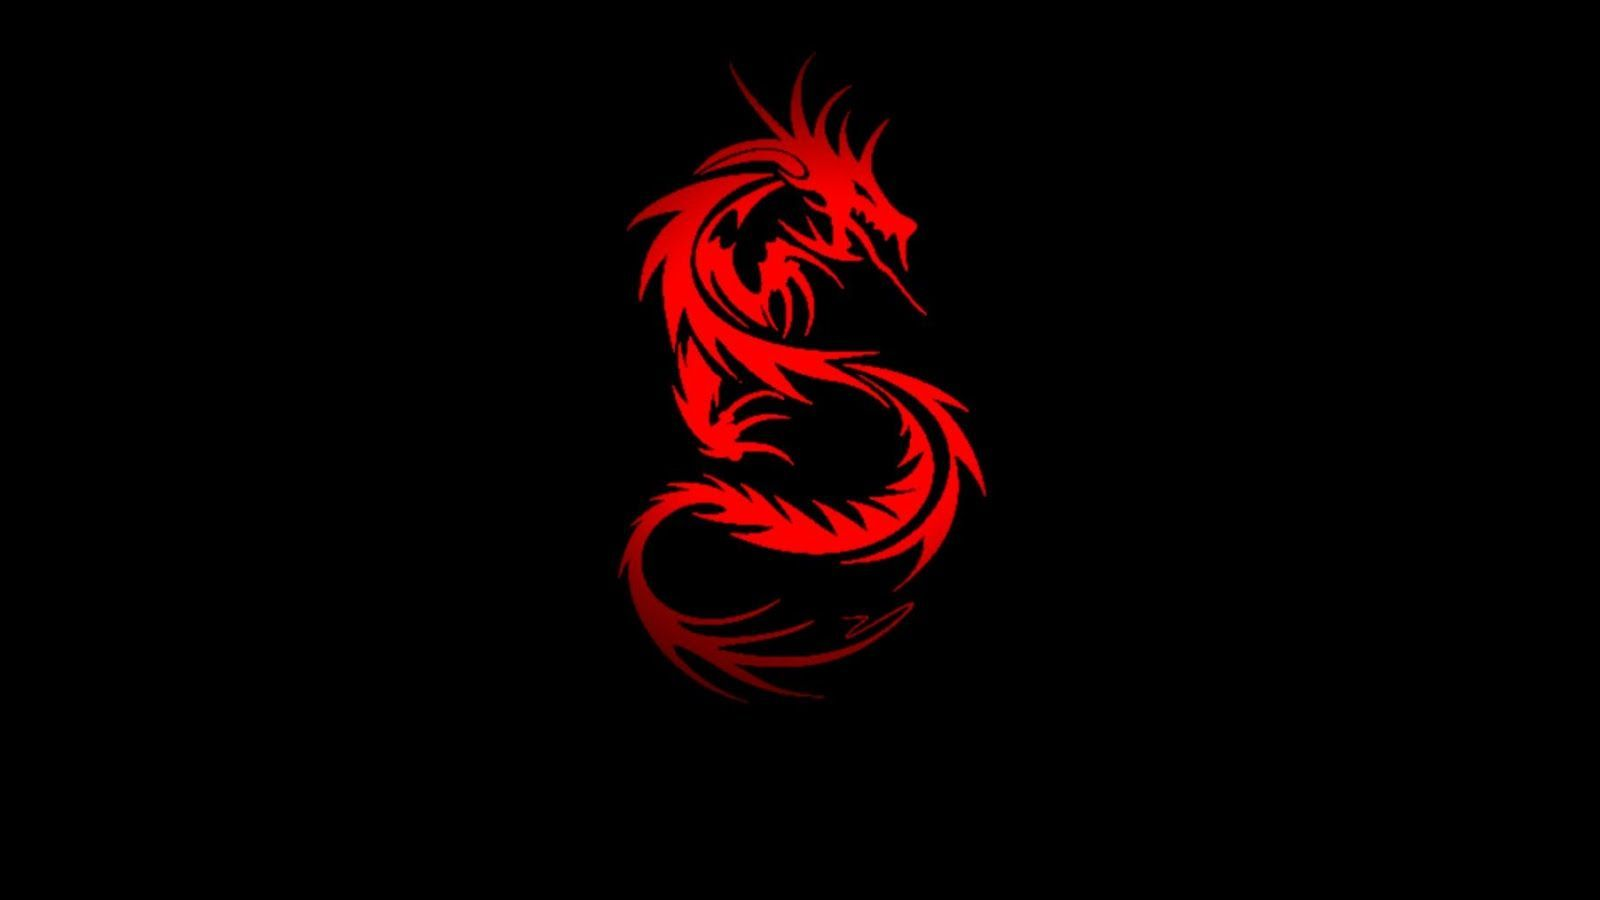 Red And Black Dragon Logo Logodix